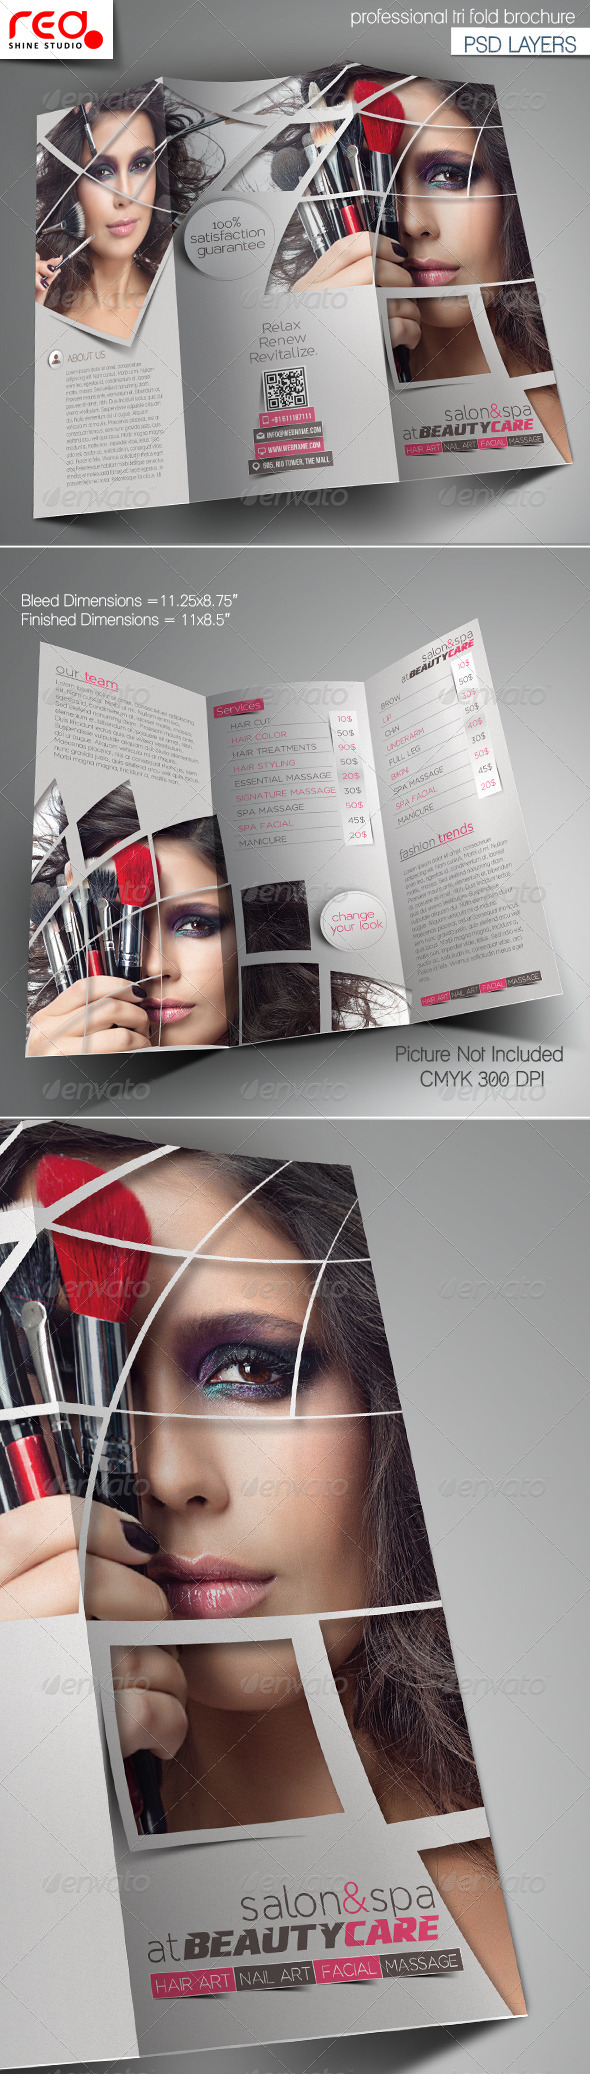 Beauty Care & Salon Trifold Brochure Template - Catalogs Brochures